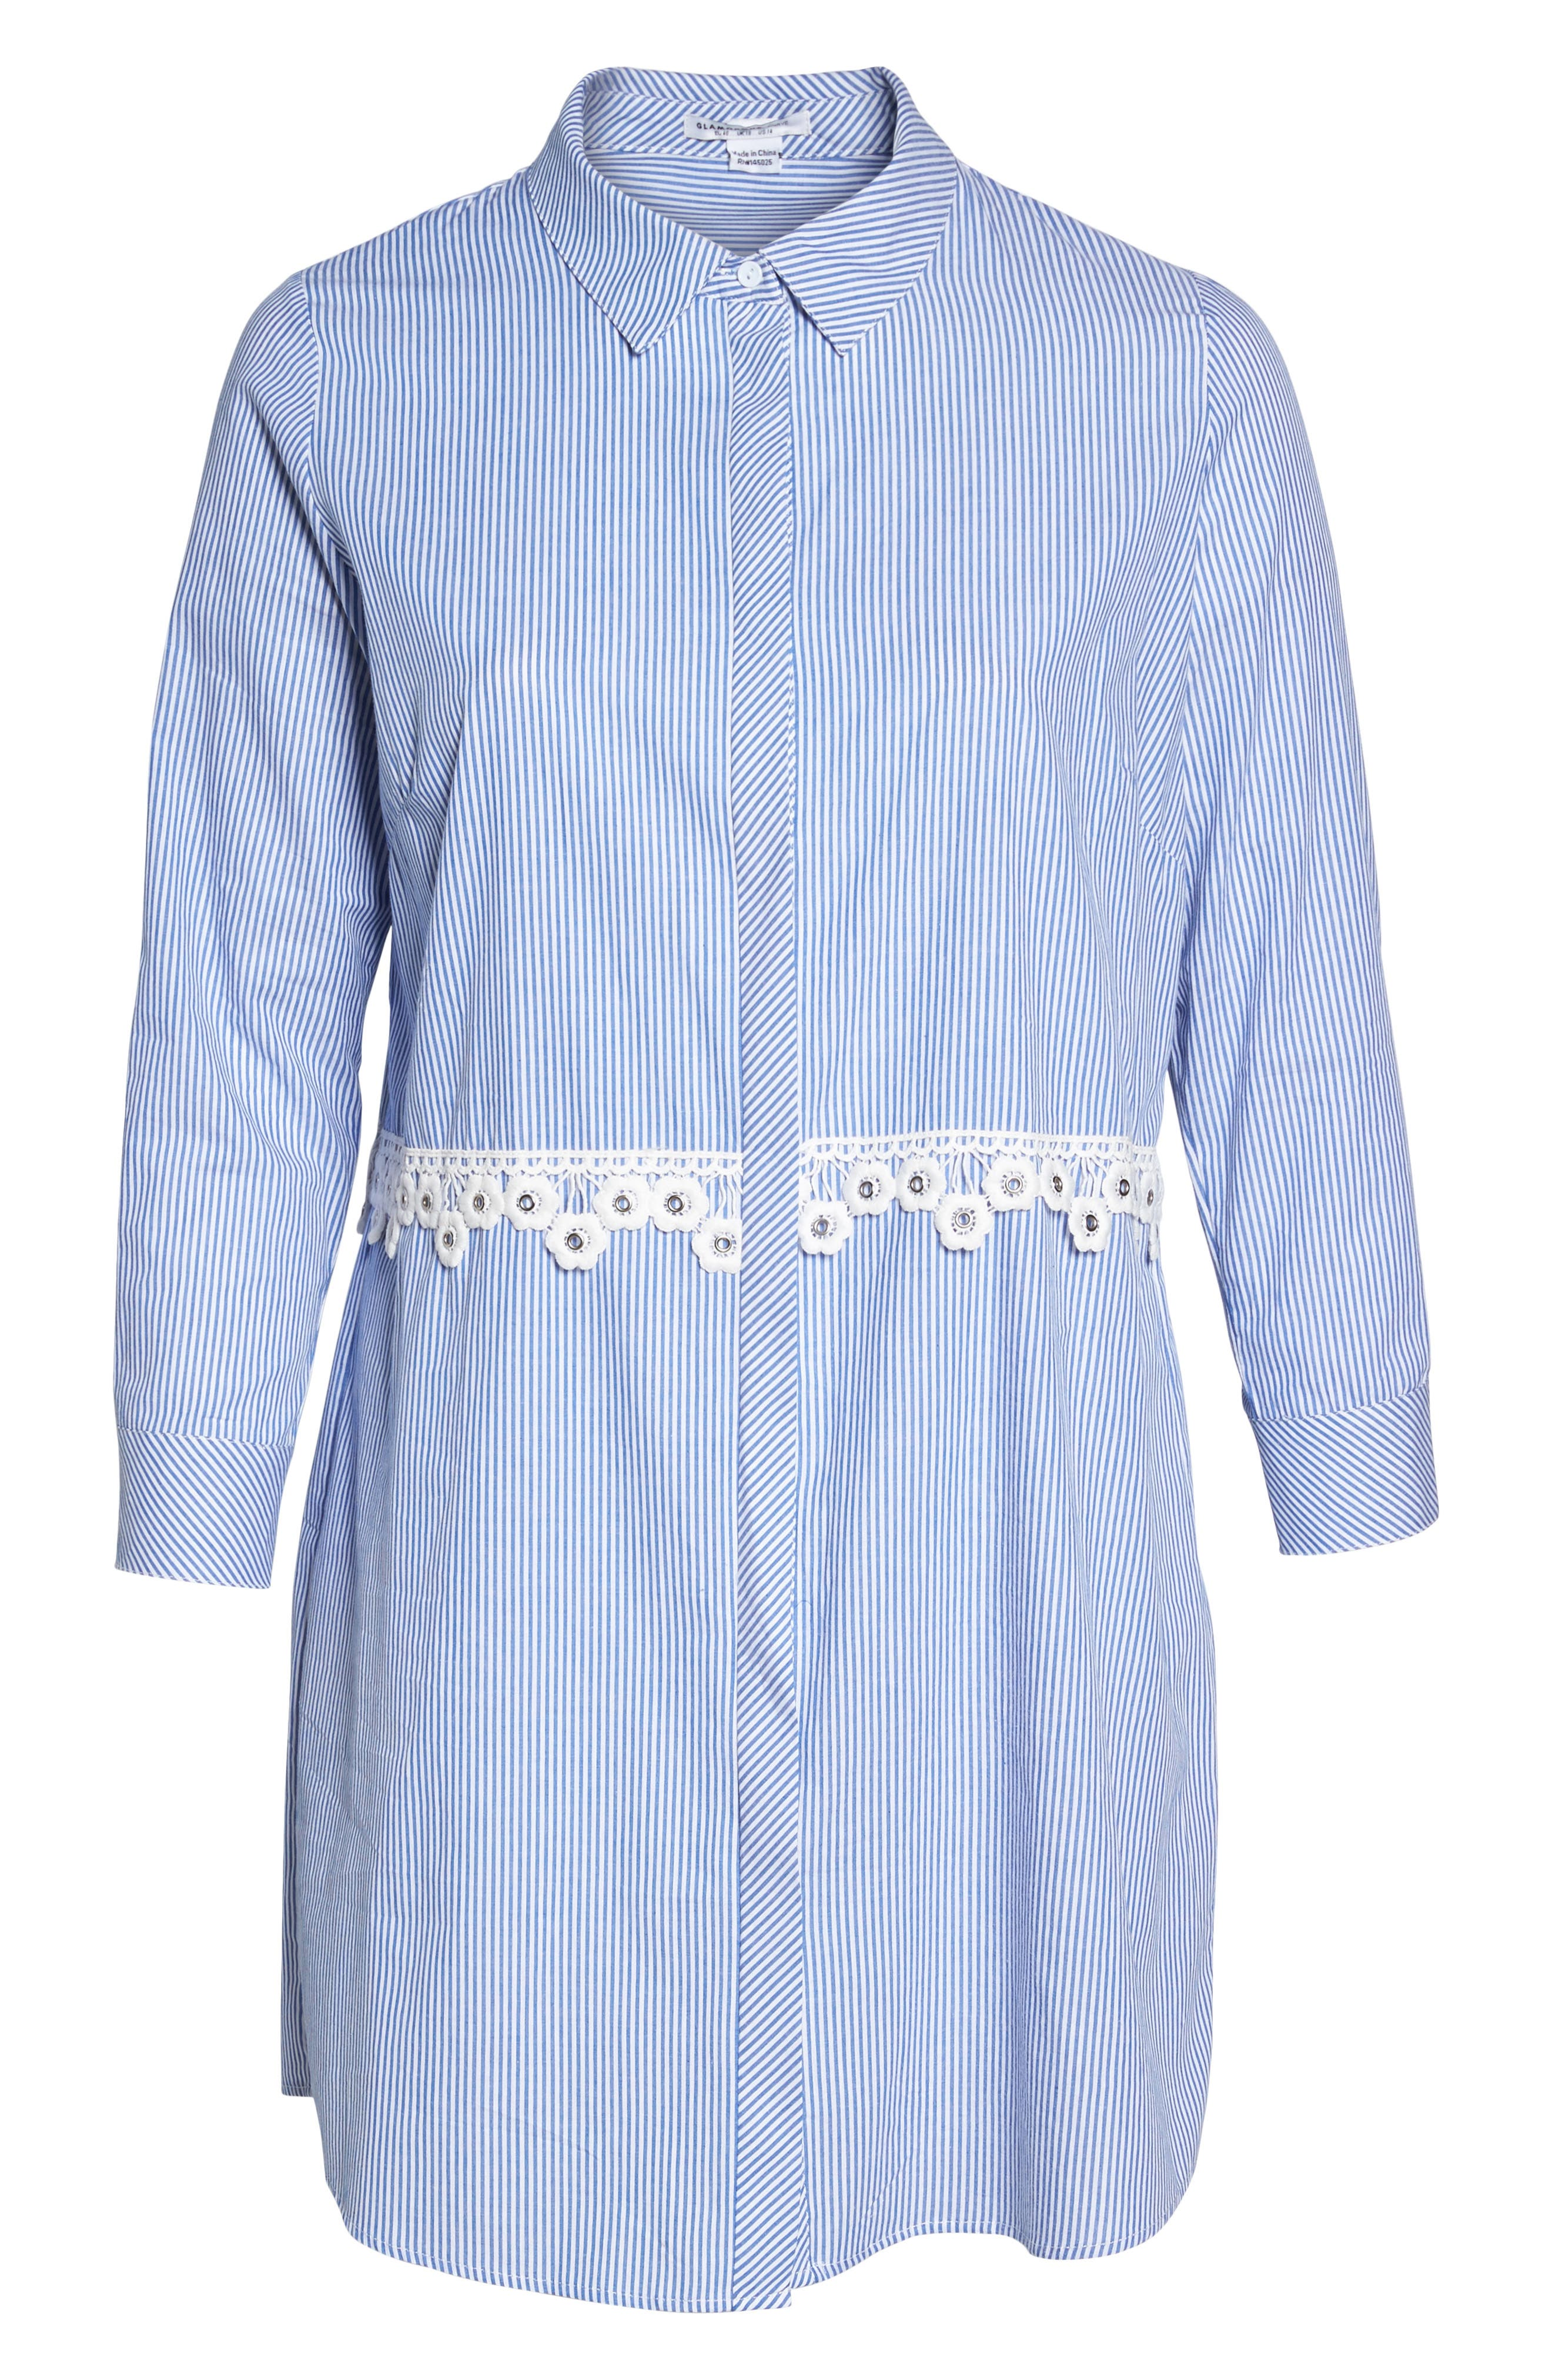 Flower Waist Stripe Shirtdress,                             Alternate thumbnail 6, color,                             Blue White Stripe